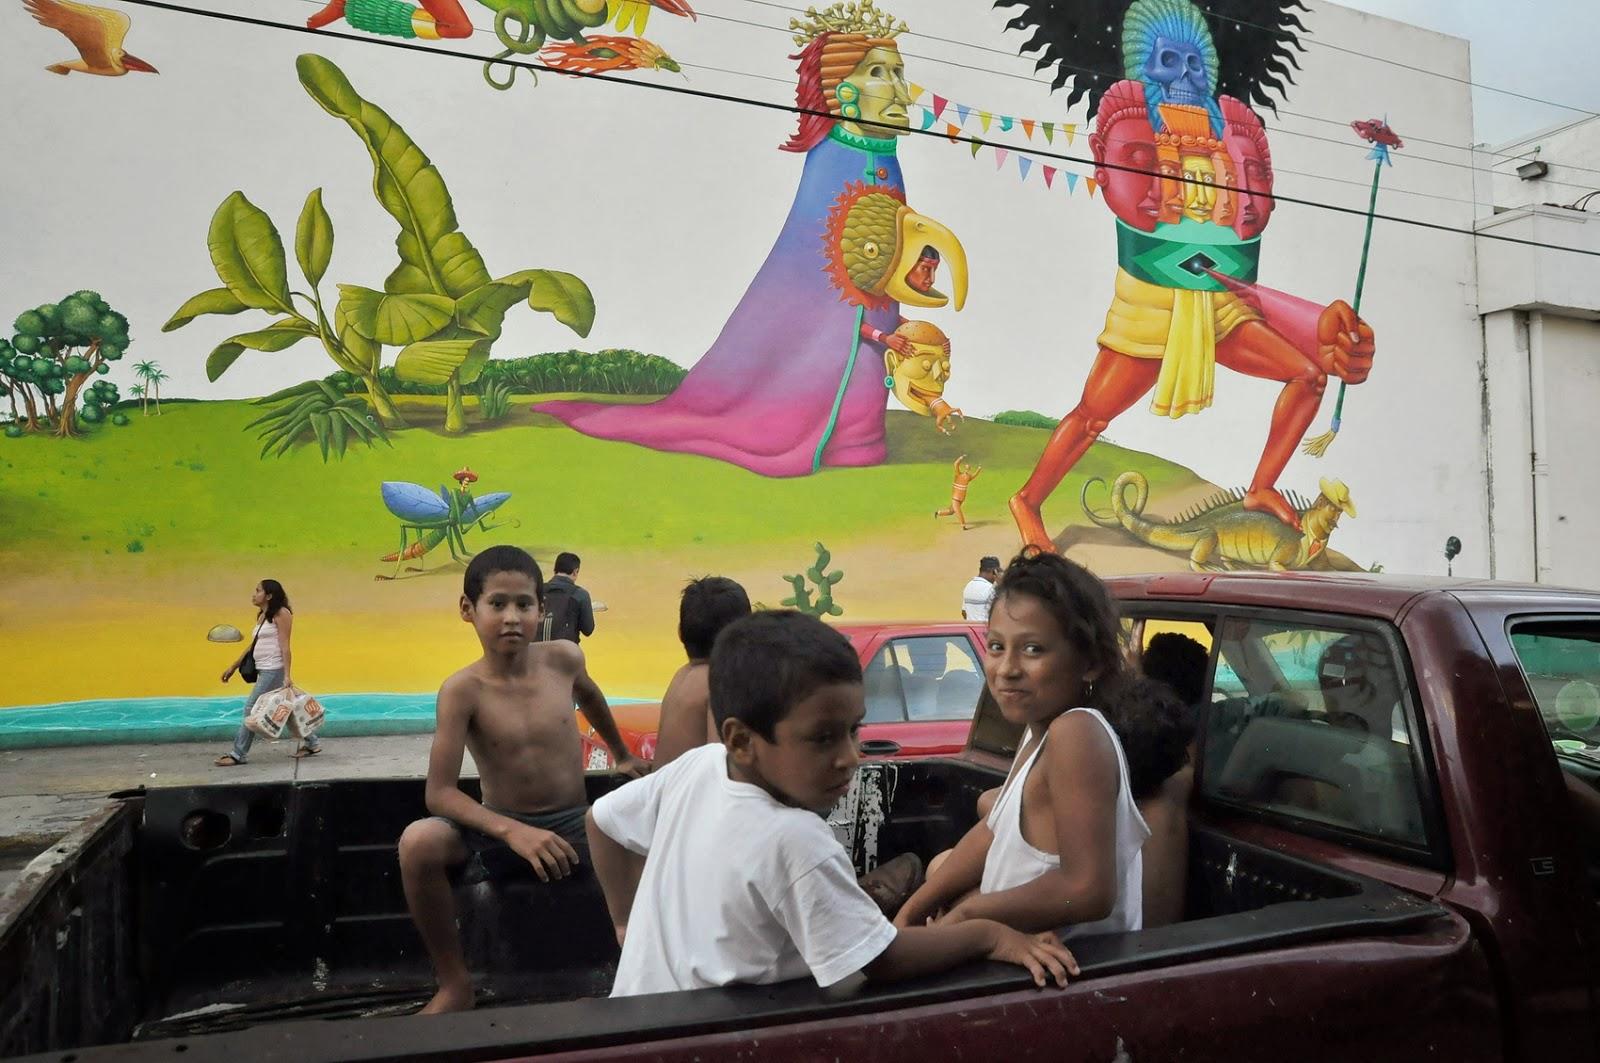 interesni-kazki-new-mural-campeche-mexico-24